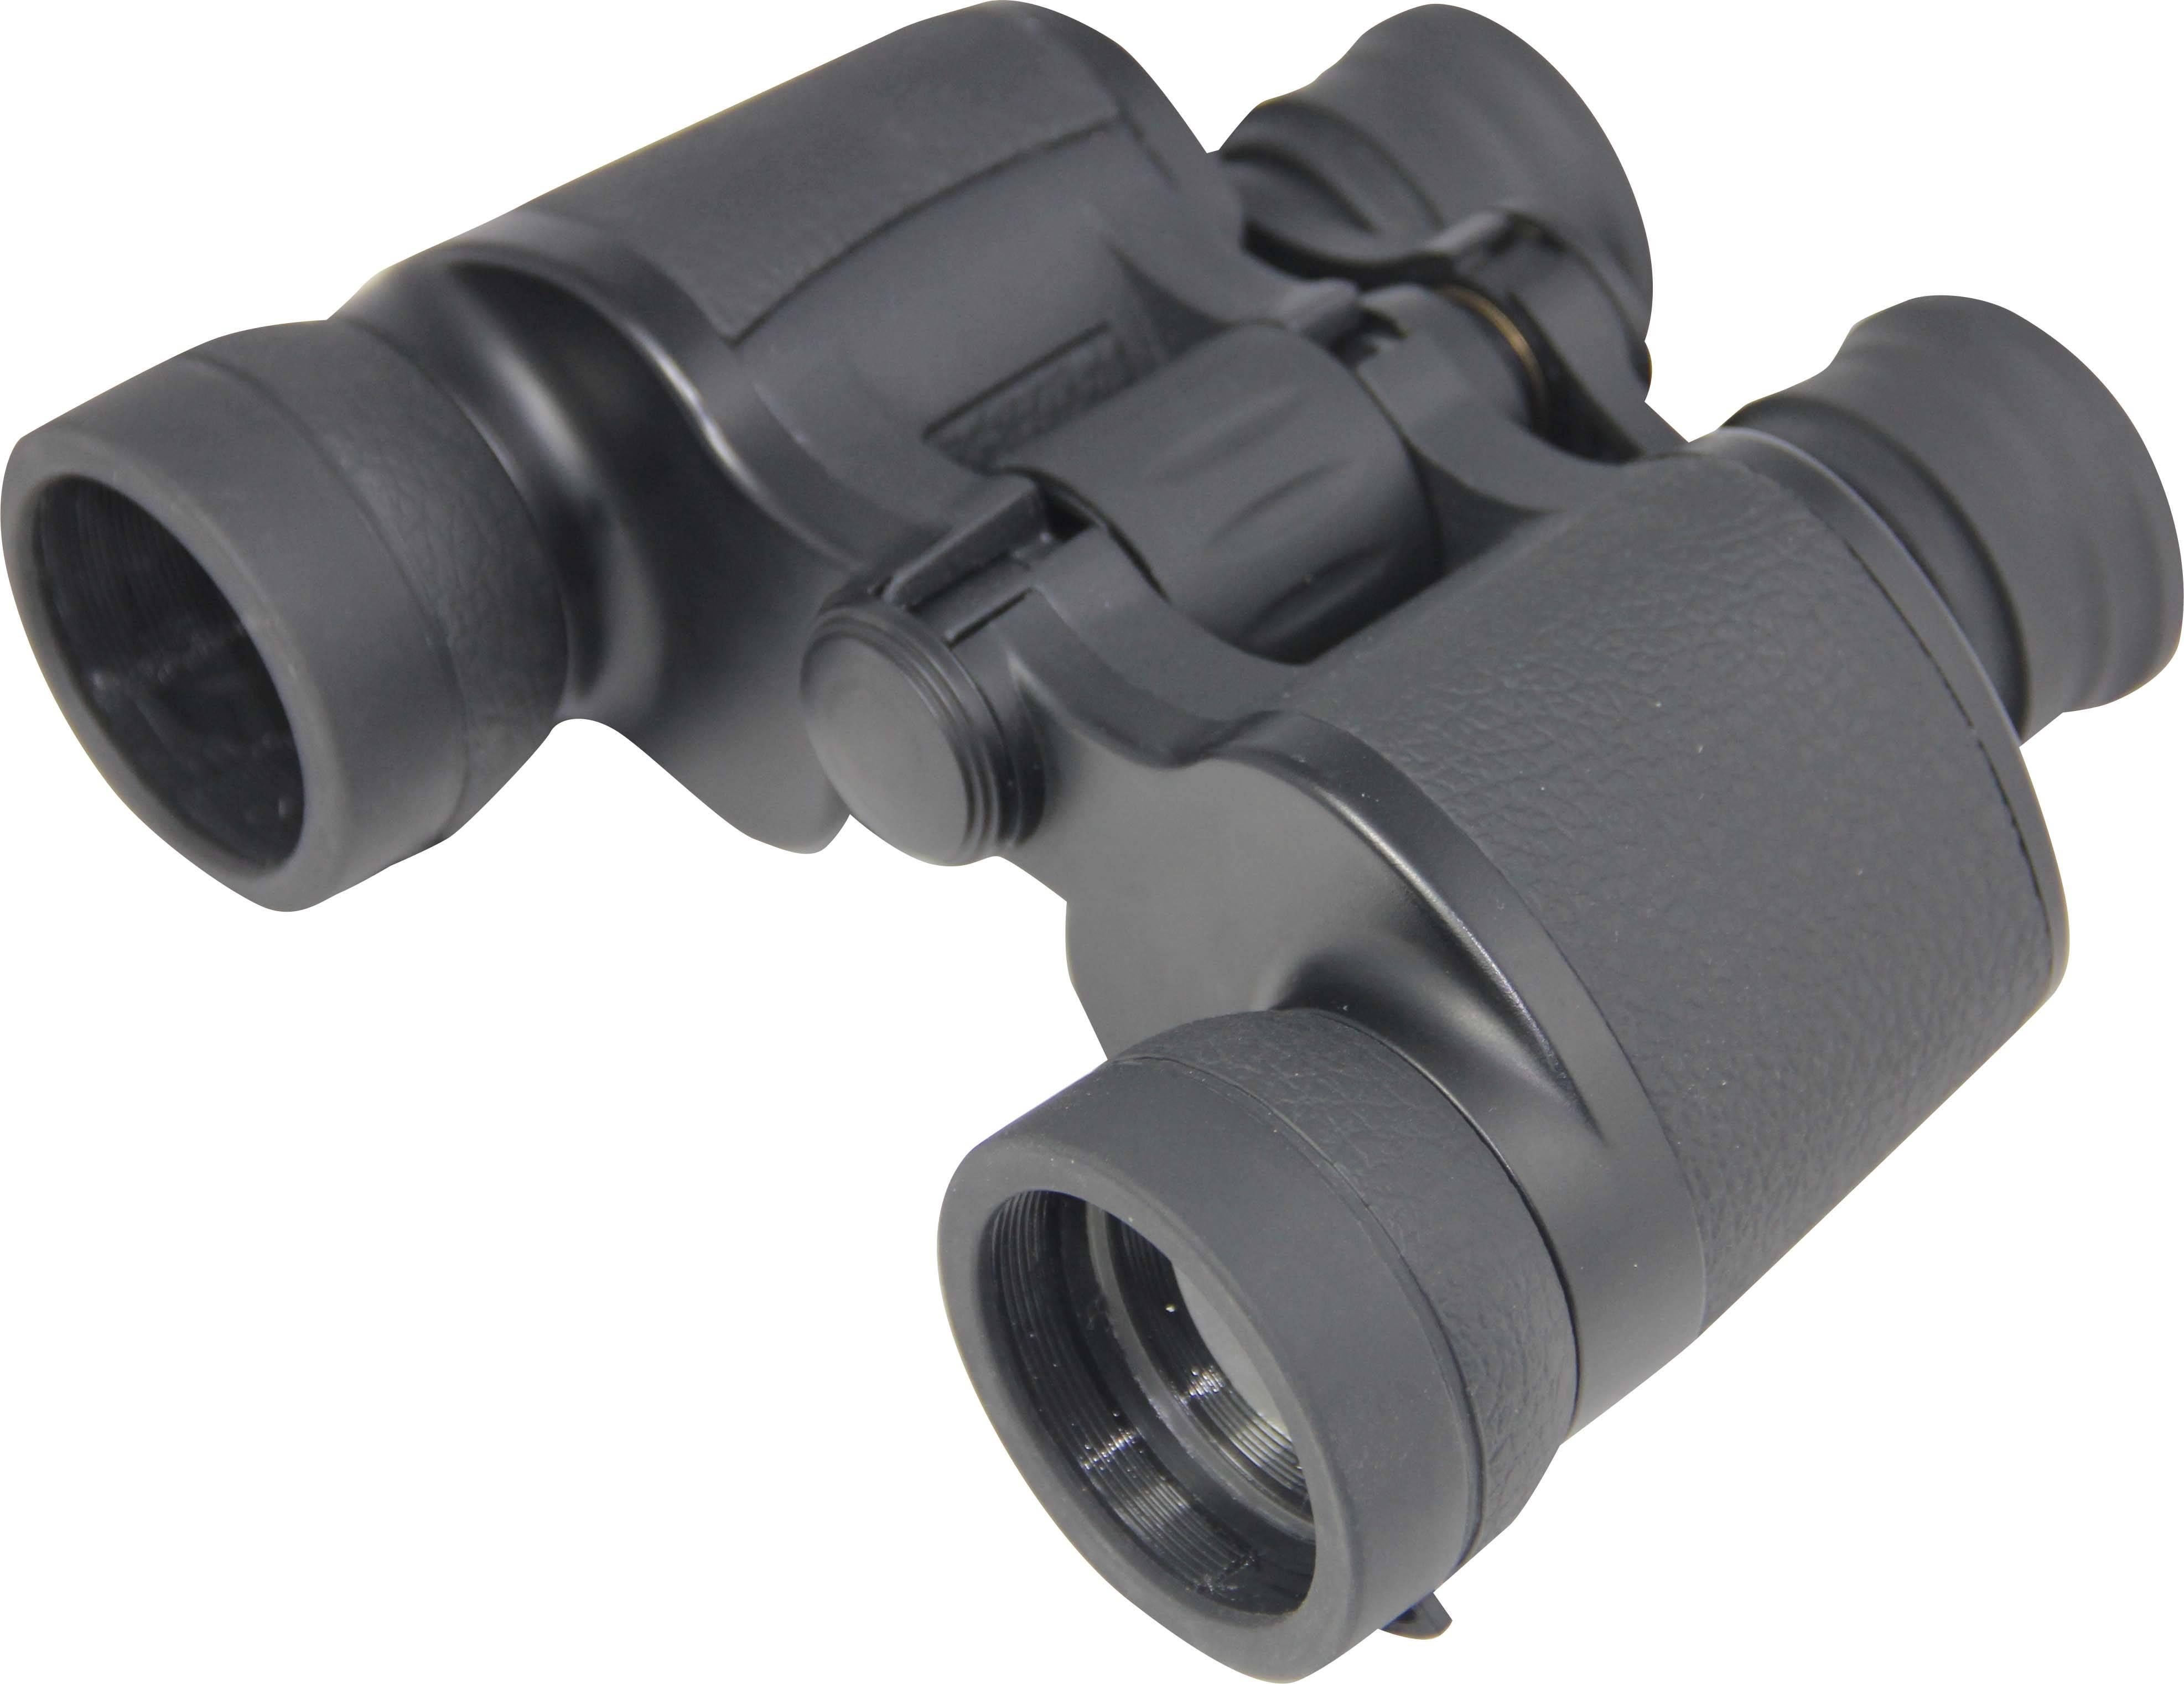 (BM-5008)New designed water proof 2015 new arrival Long Eye Relief Binoculars for sale